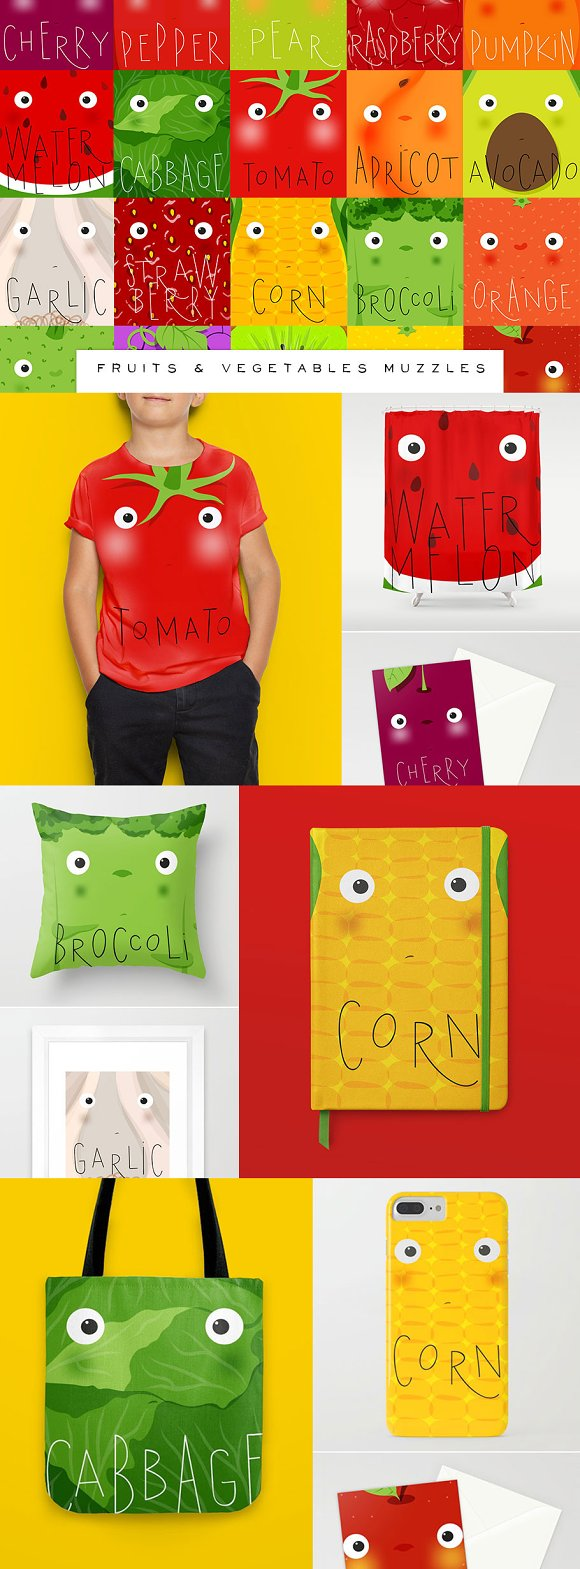 Fruits & Vegetables Muzzles